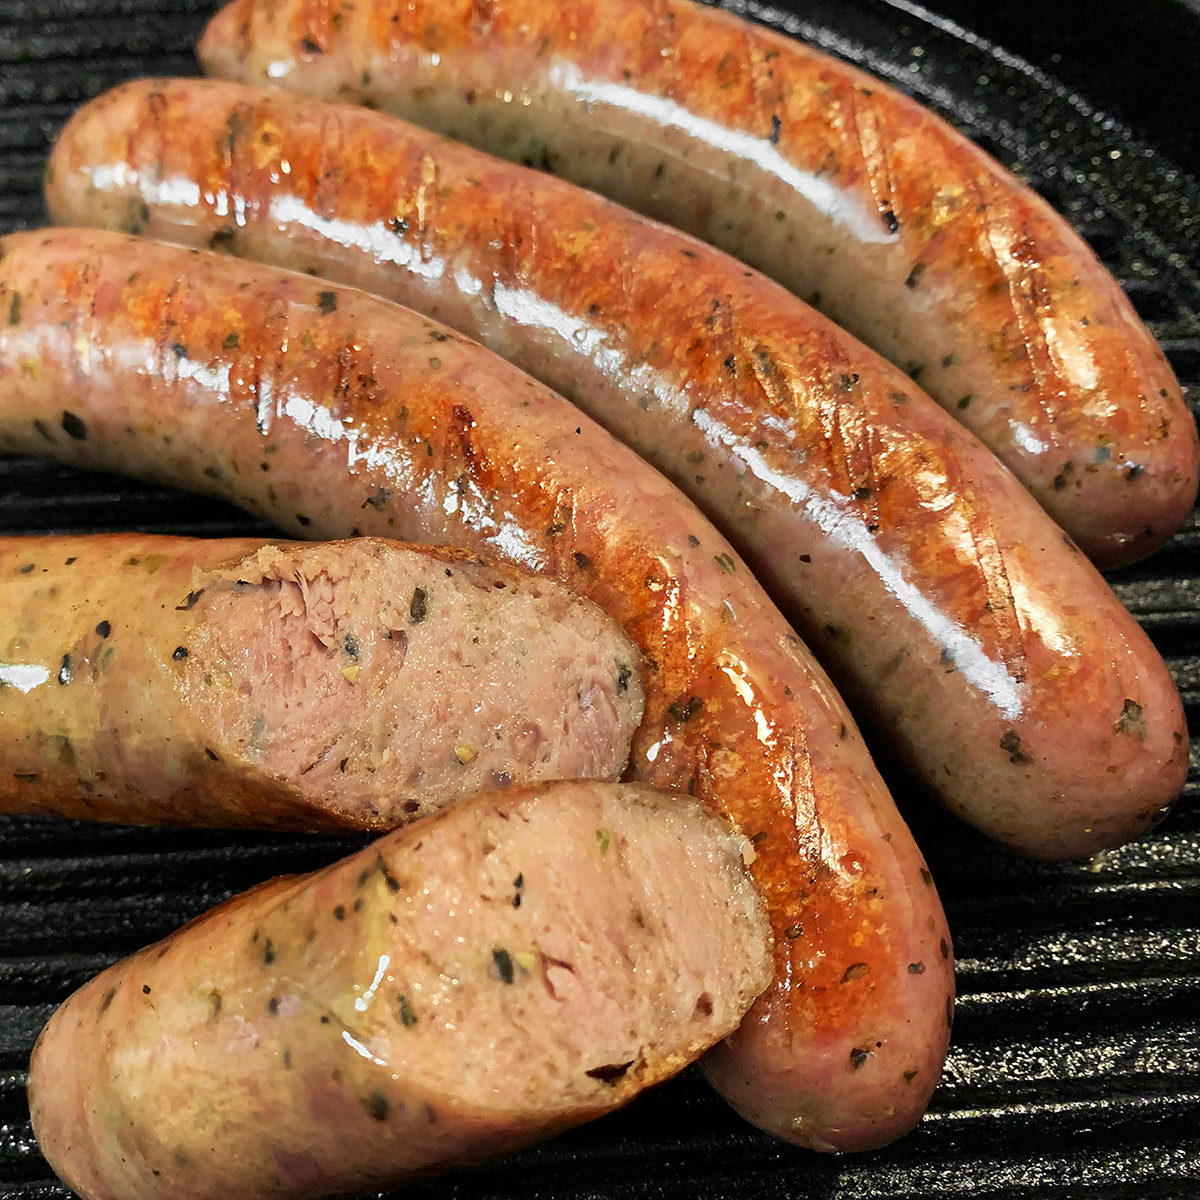 IFFA2019食肉加工品国際コンテストで銅メダルを受賞 ラム肉のサルシッチャ 70gx4本 冷凍 新商品 新型 バジル風味のイタリア風 未使用品